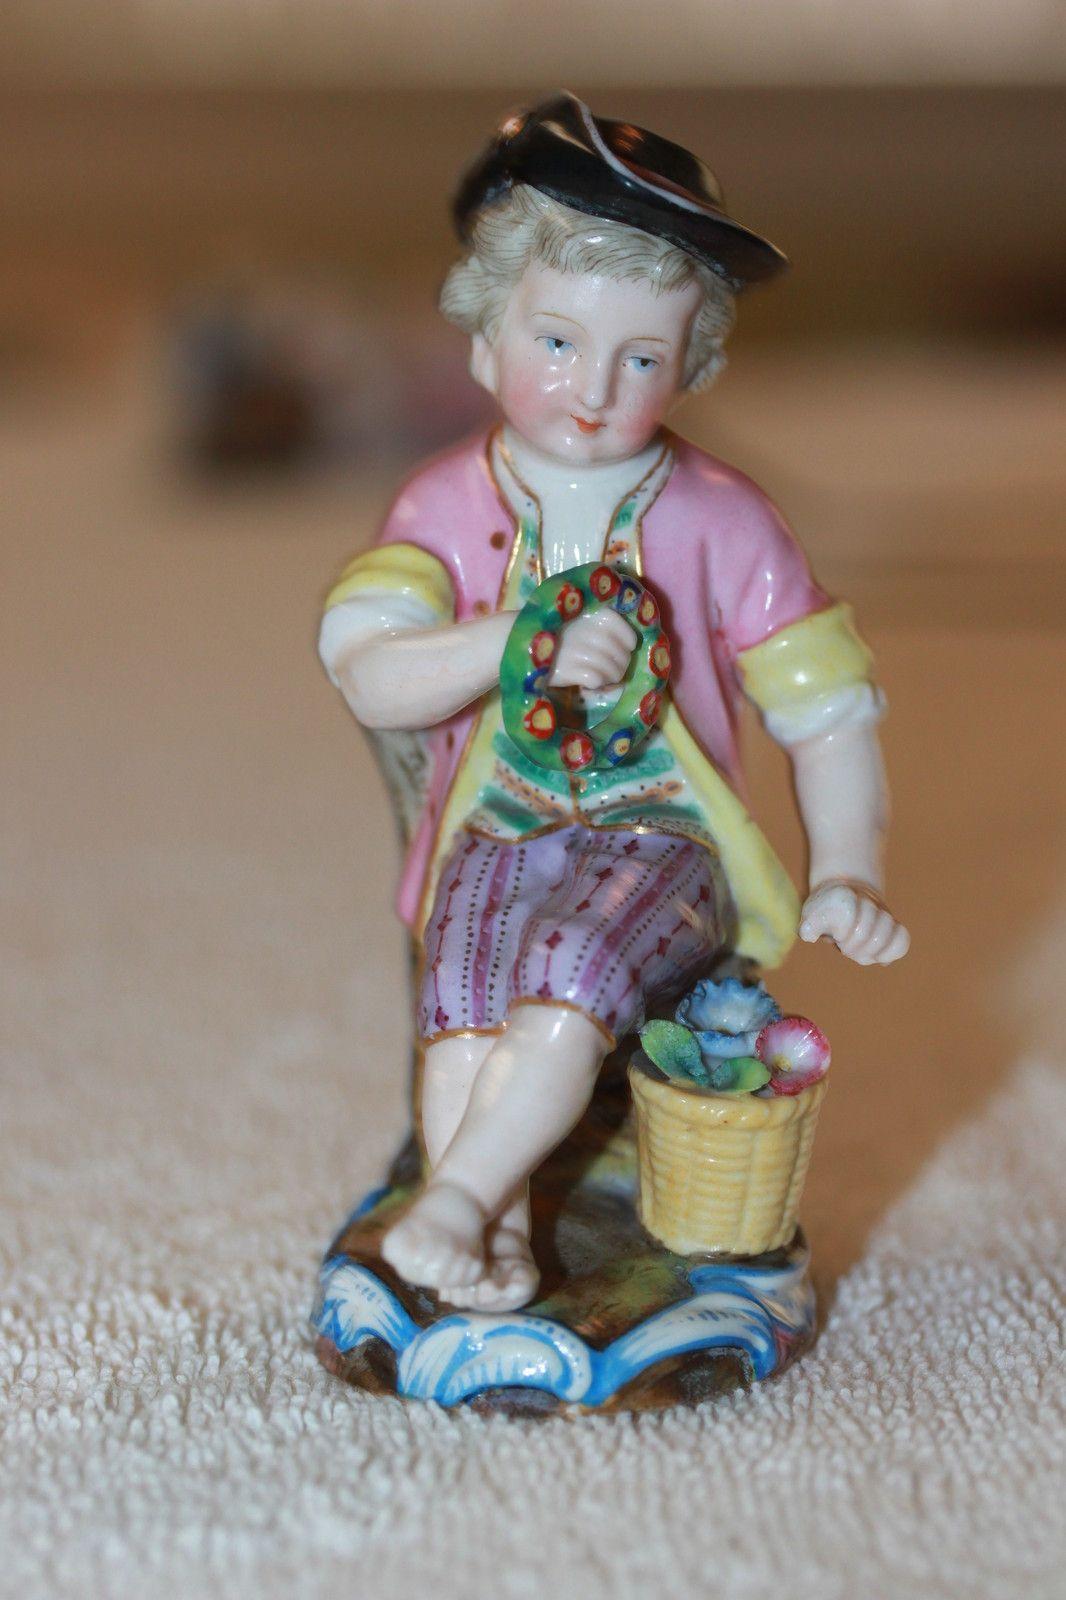 Item 1338 Antique Meissen Dresden Style Germany Porcelain Figurine $295 | eBay